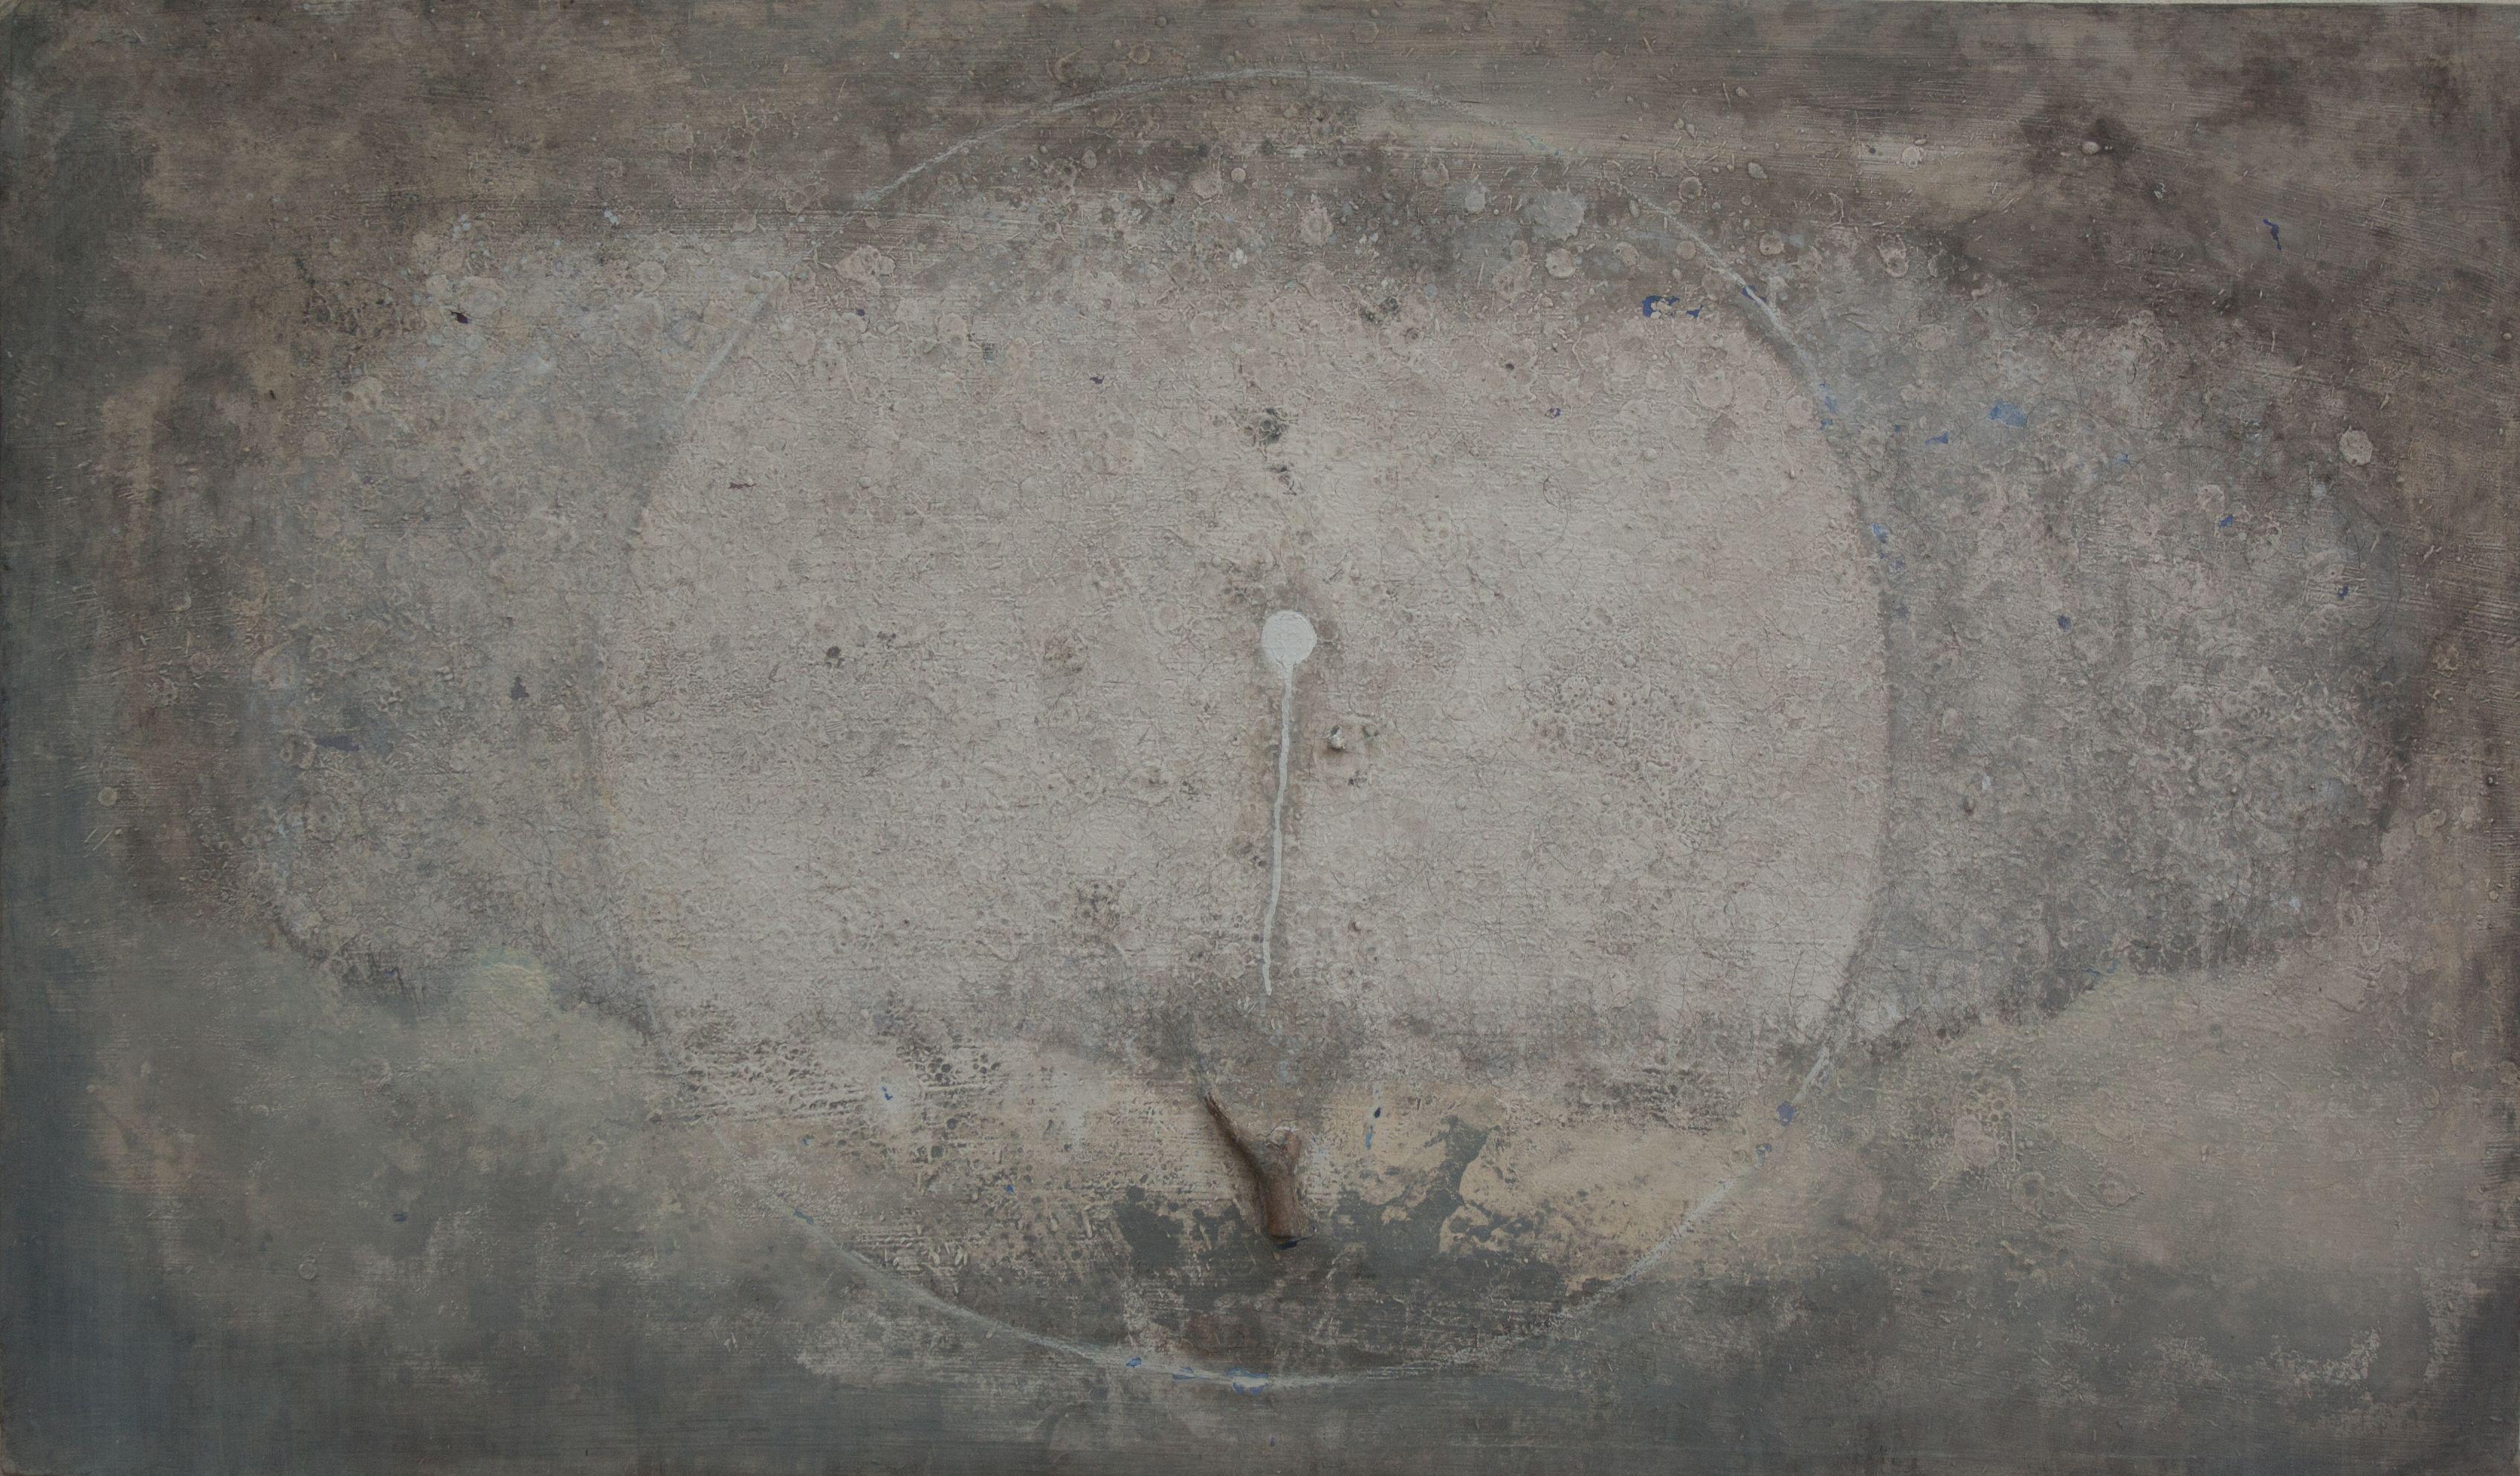 Mixed technique on canvas. 86 x 145 cm. 2012